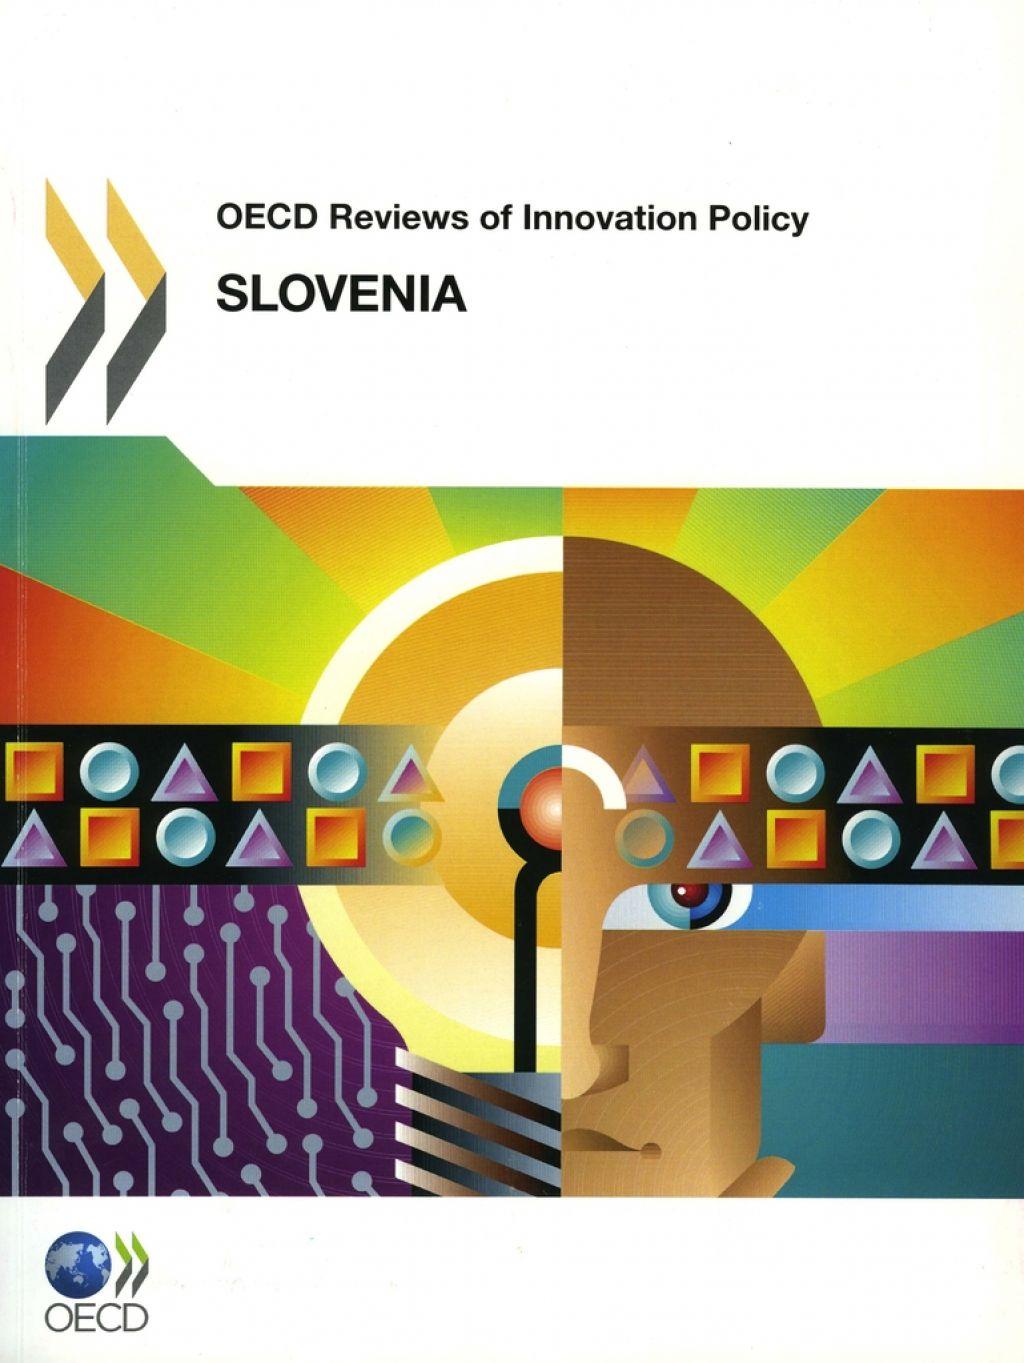 Inovativnost v Sloveniji ima dobre osnove